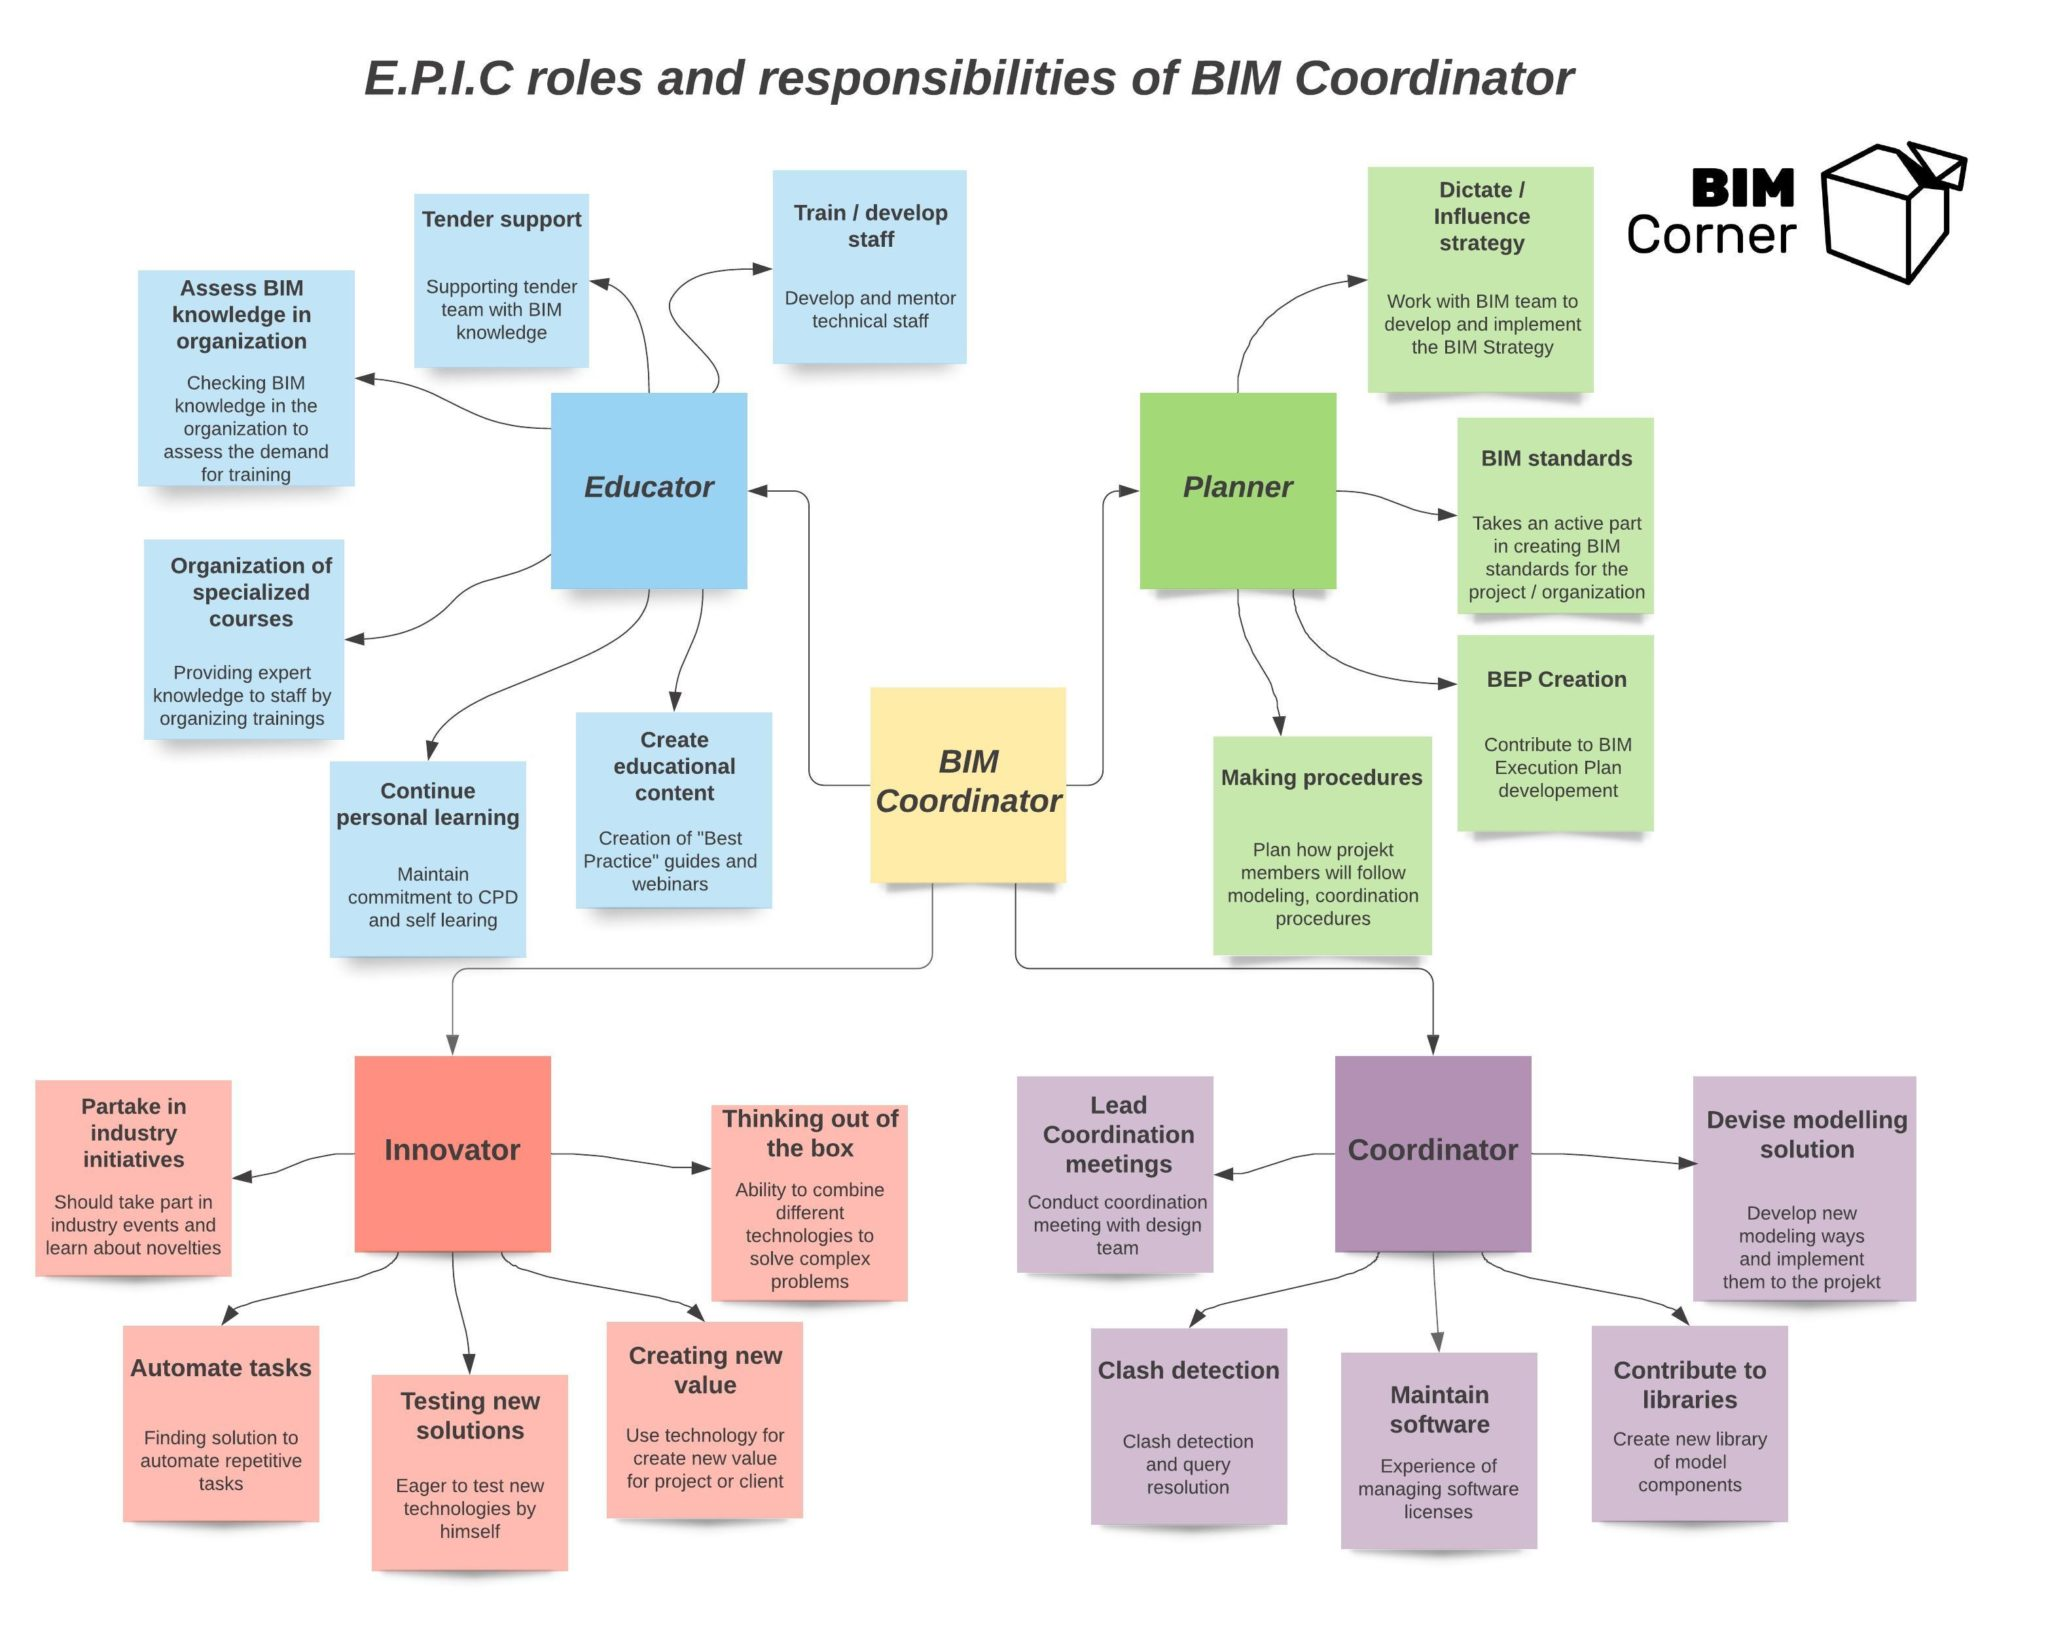 BIM Coordinator roles and responsibilities